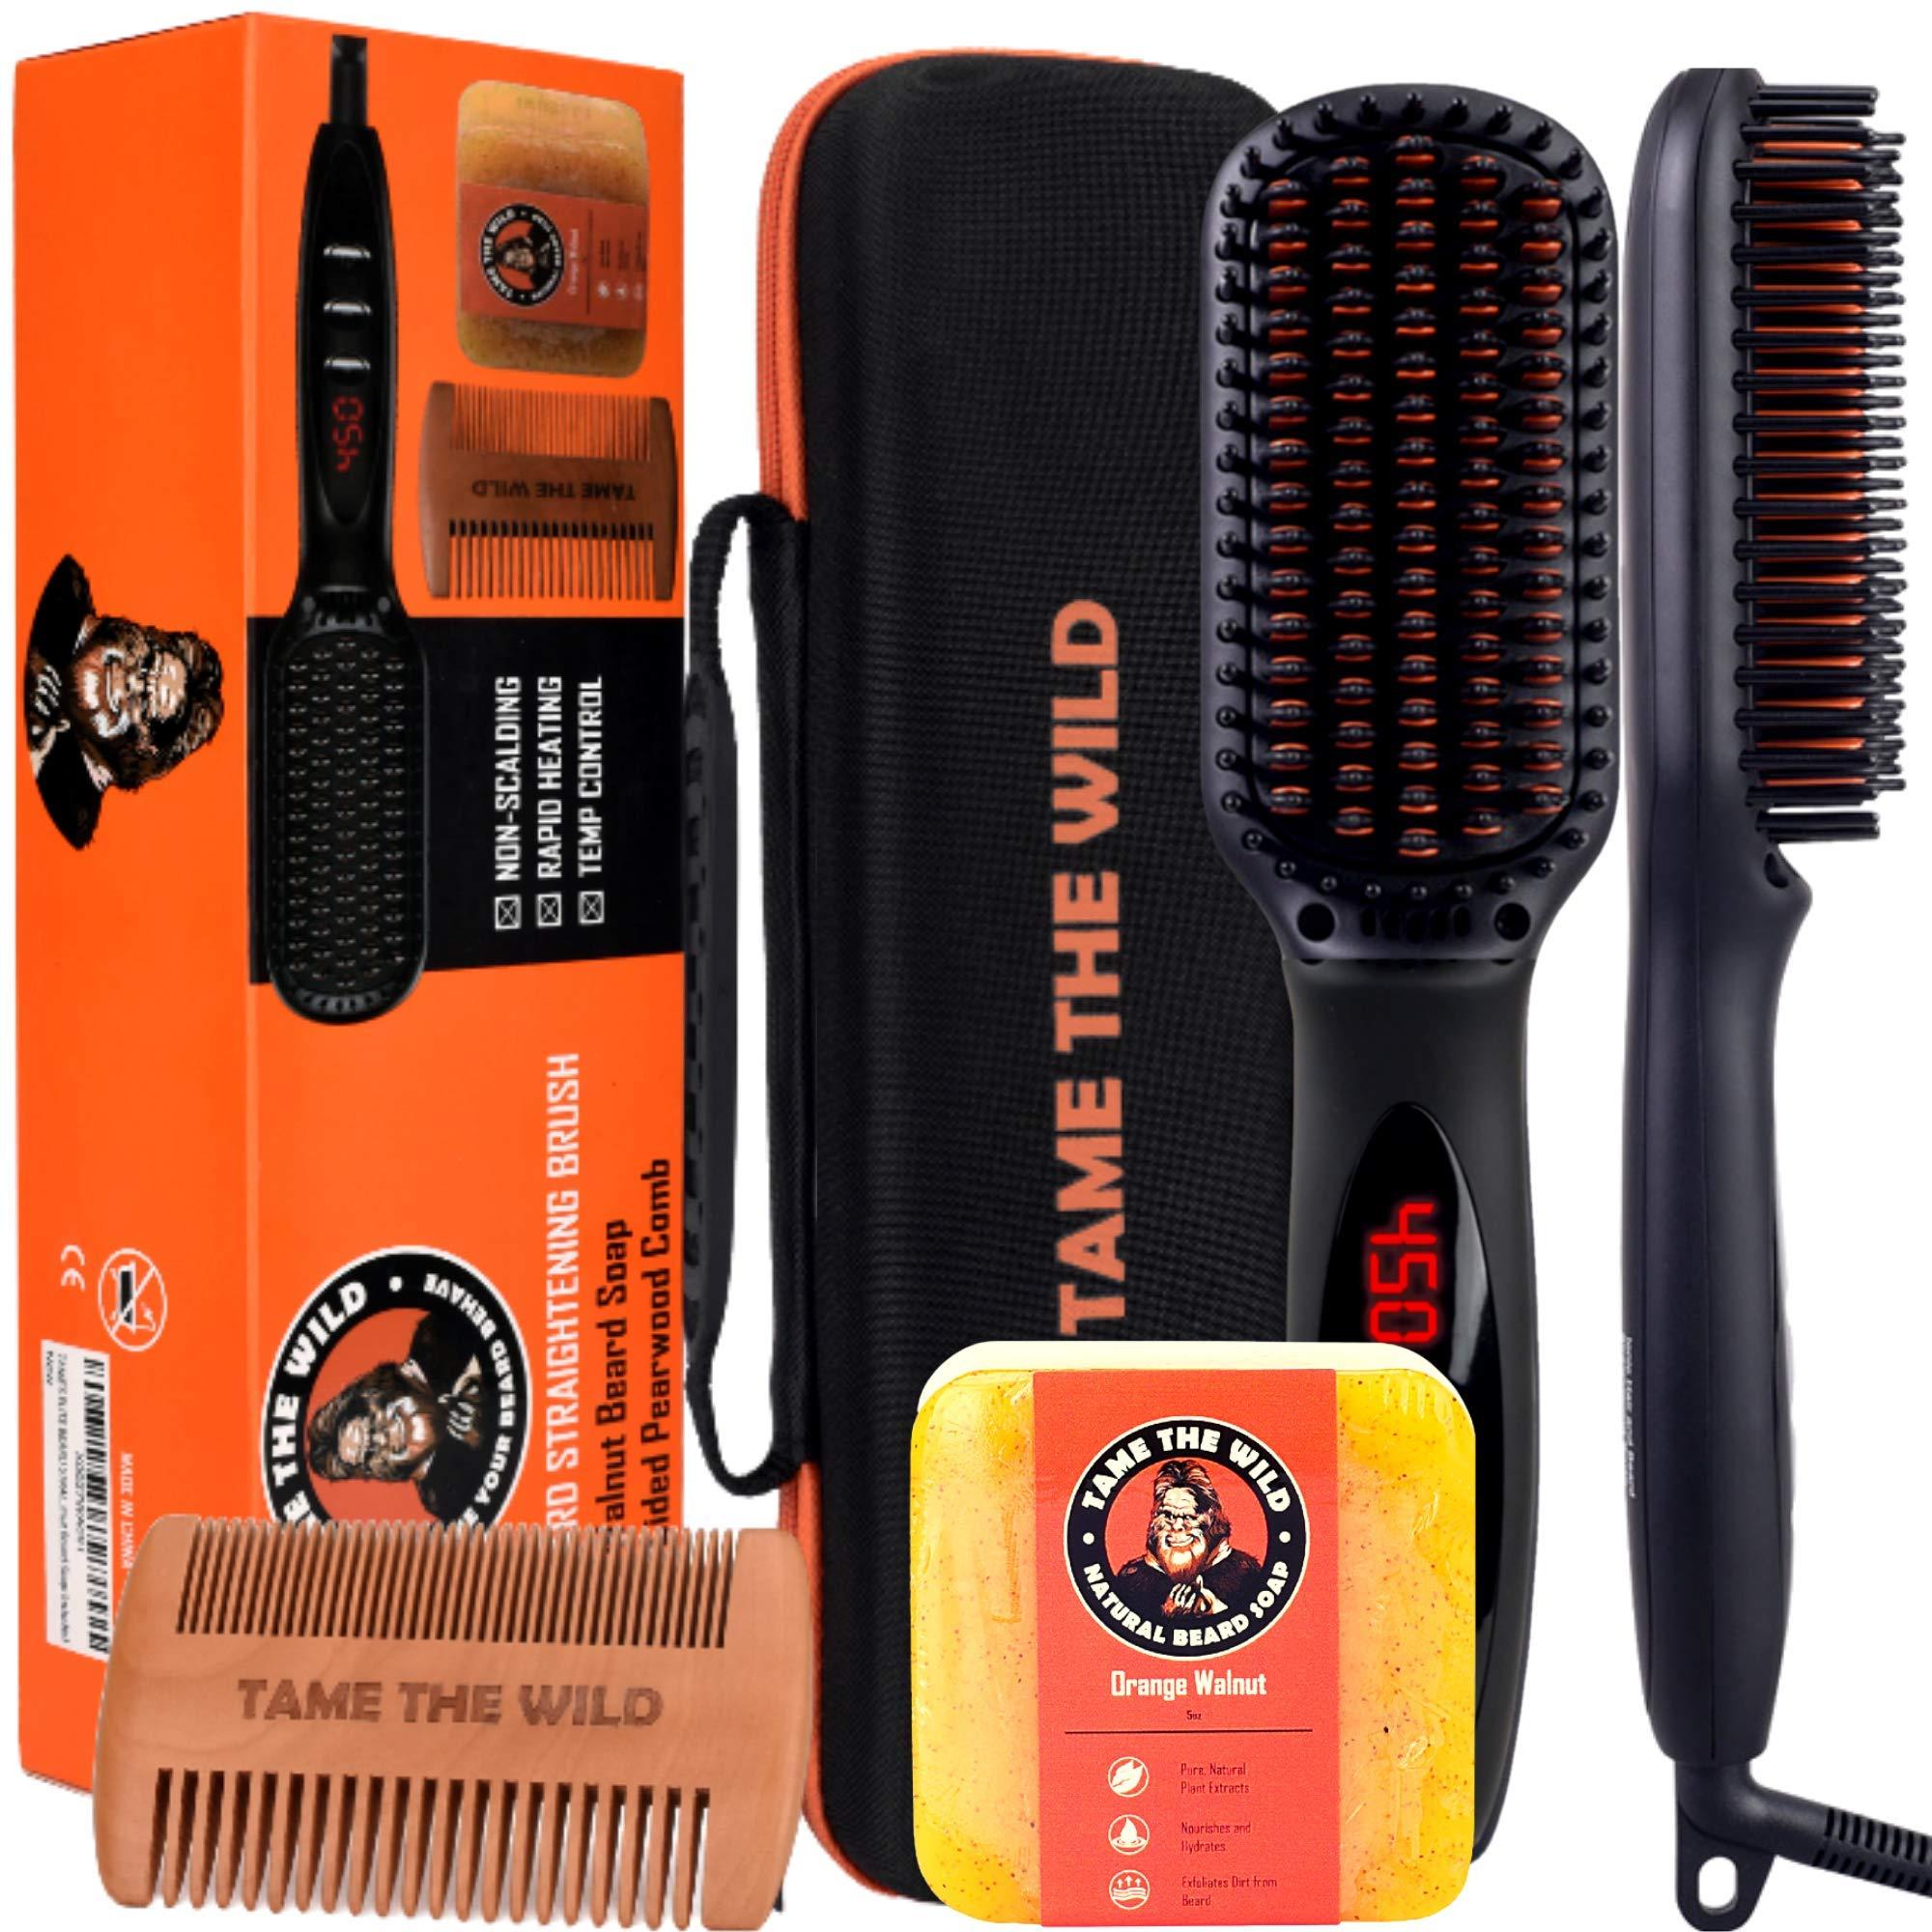 "Tame's Elite Beard Straightener Brush Kit - Anti-Scald Heated Beard Brush Straightener - Beard Soap - Pearwood Comb - Storage Case Included - Best for Beards Over 2"" Long."